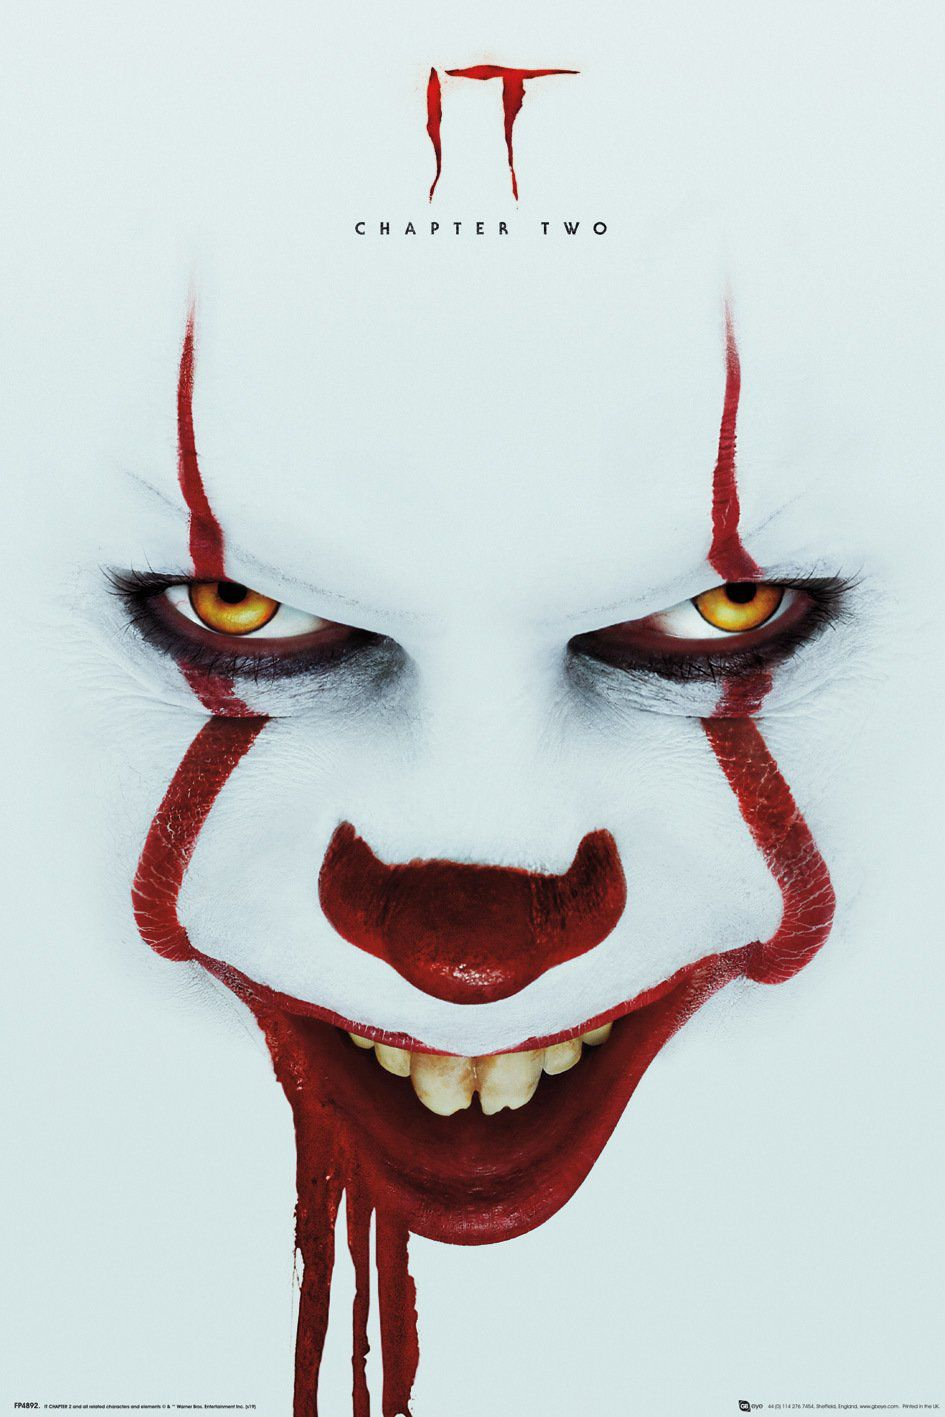 Stephen Kings Es Kapitel 2 Poster Face Pennywise The Dancing Clown Pennywise The Clown Pennywise